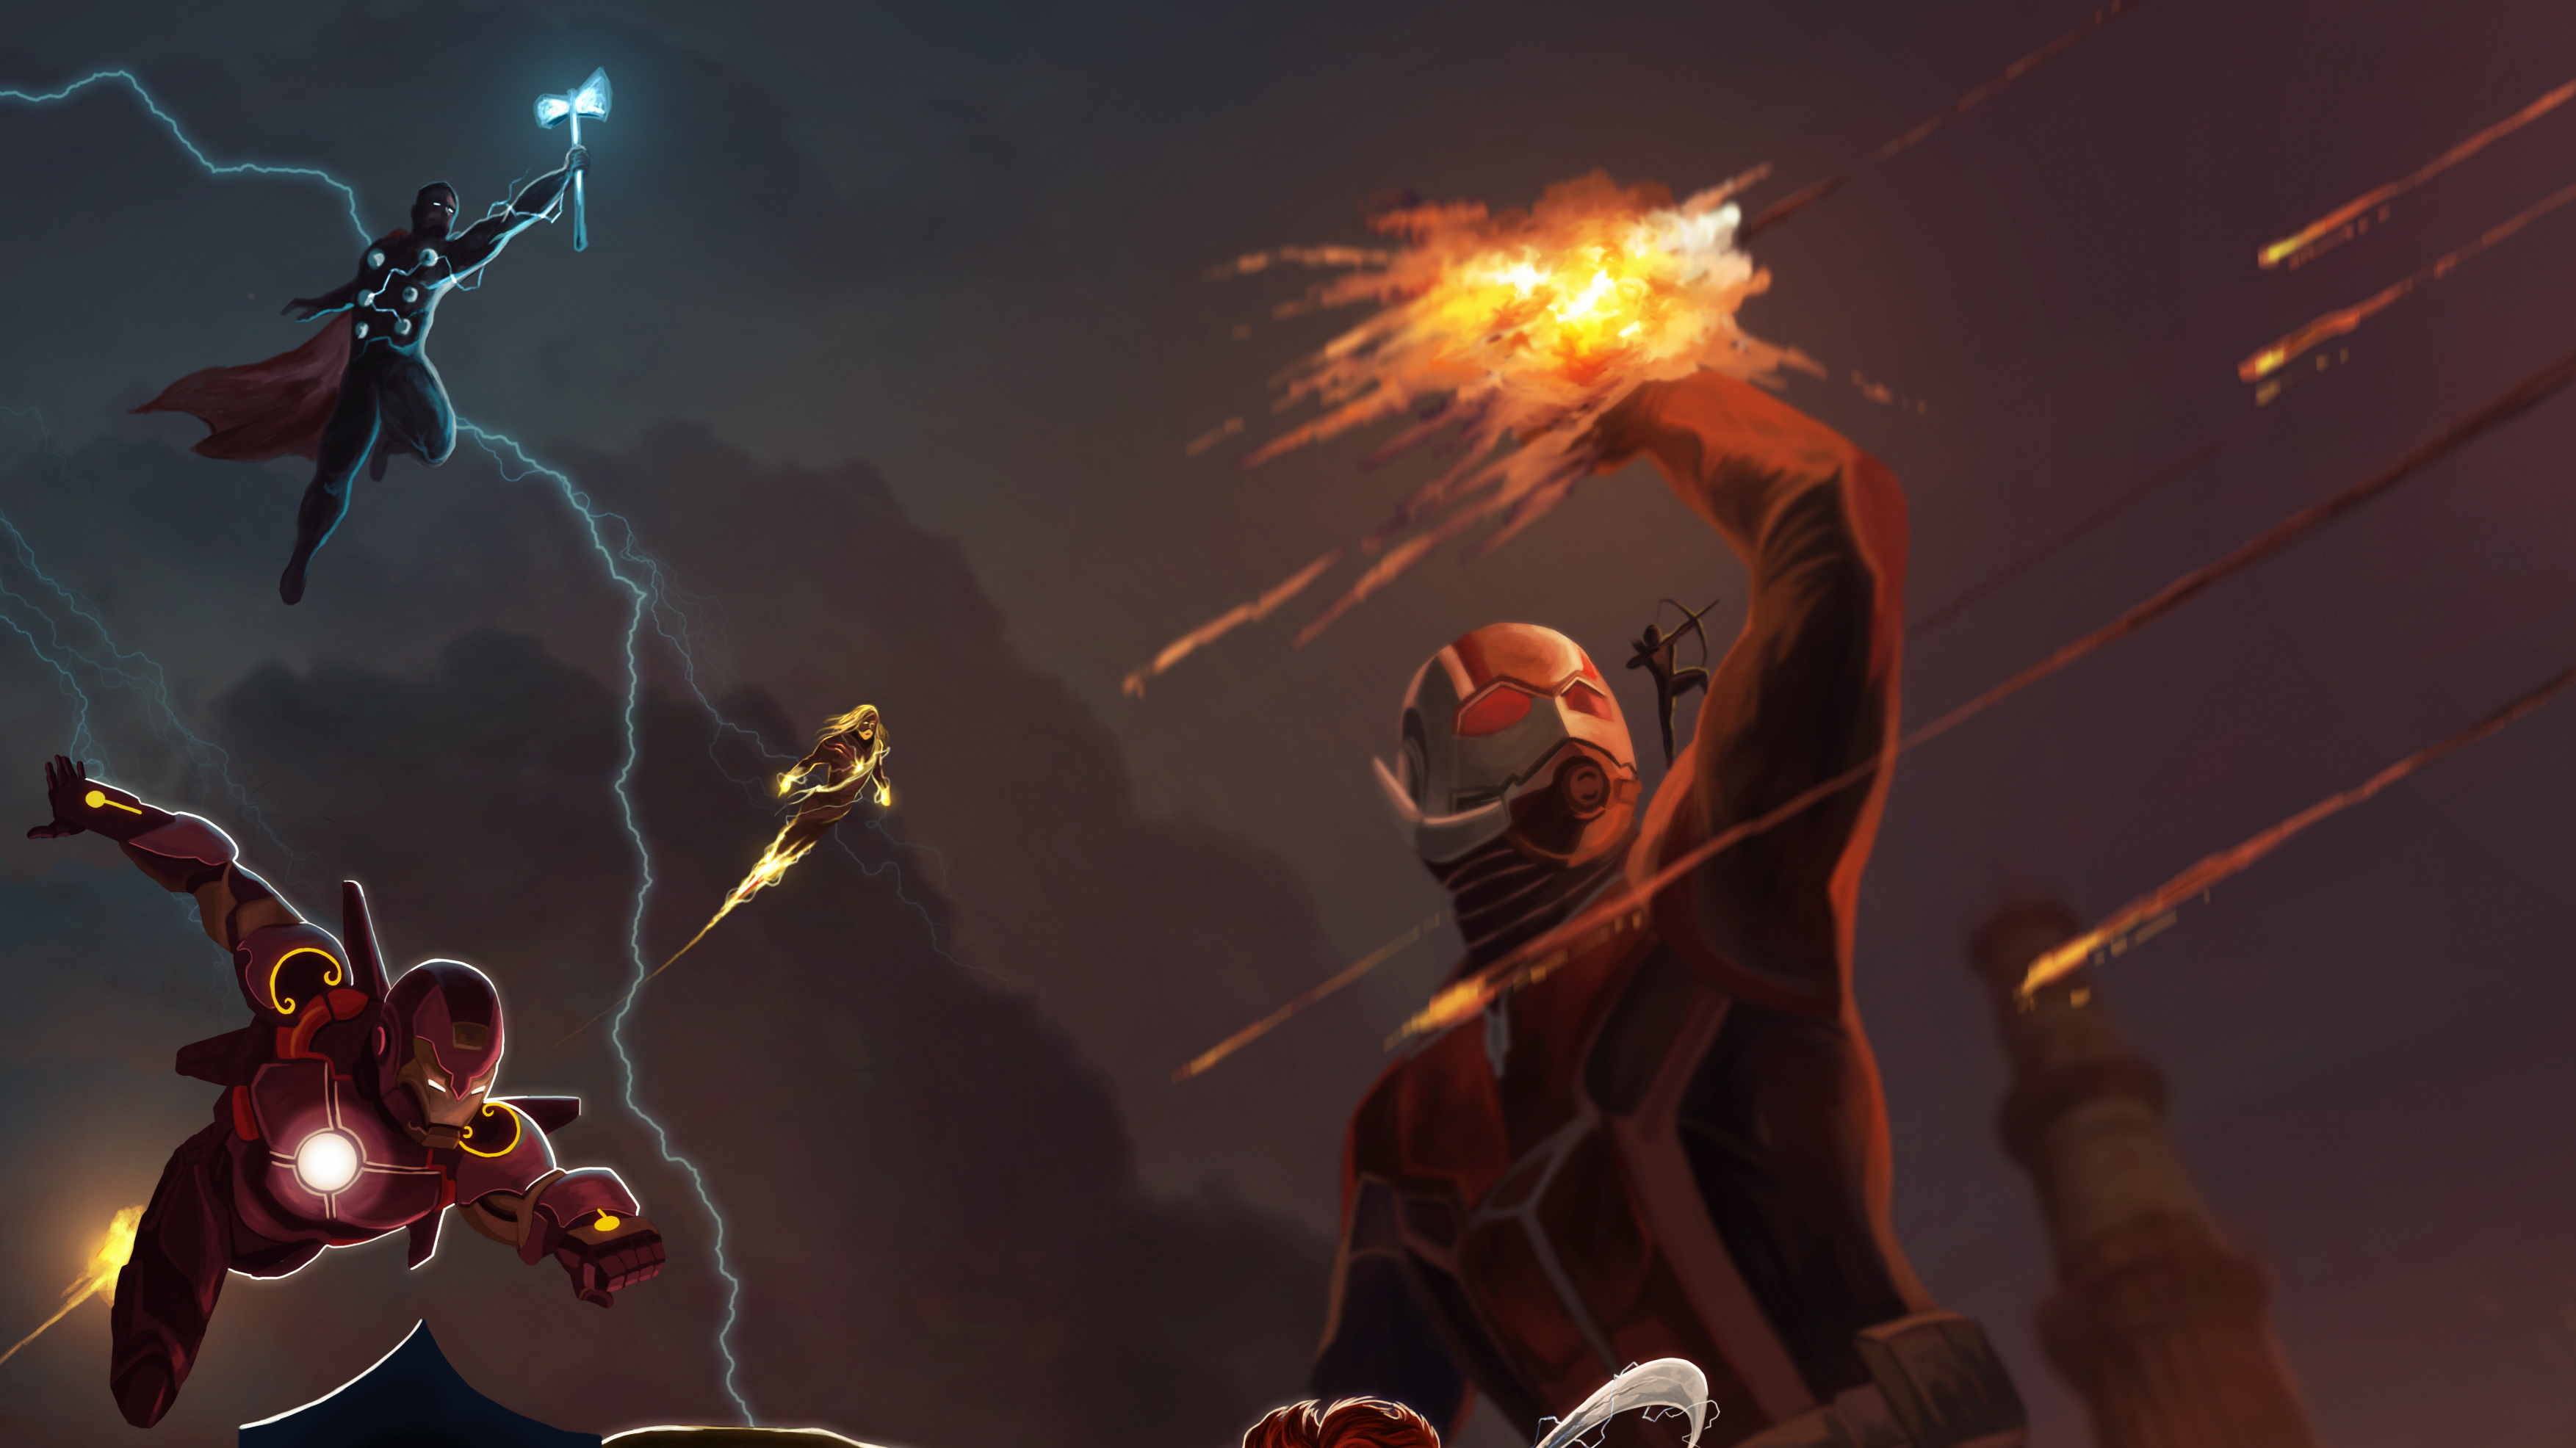 Avengers Endgame Assemble 4k Hd Superheroes 4k Wallpapers Images